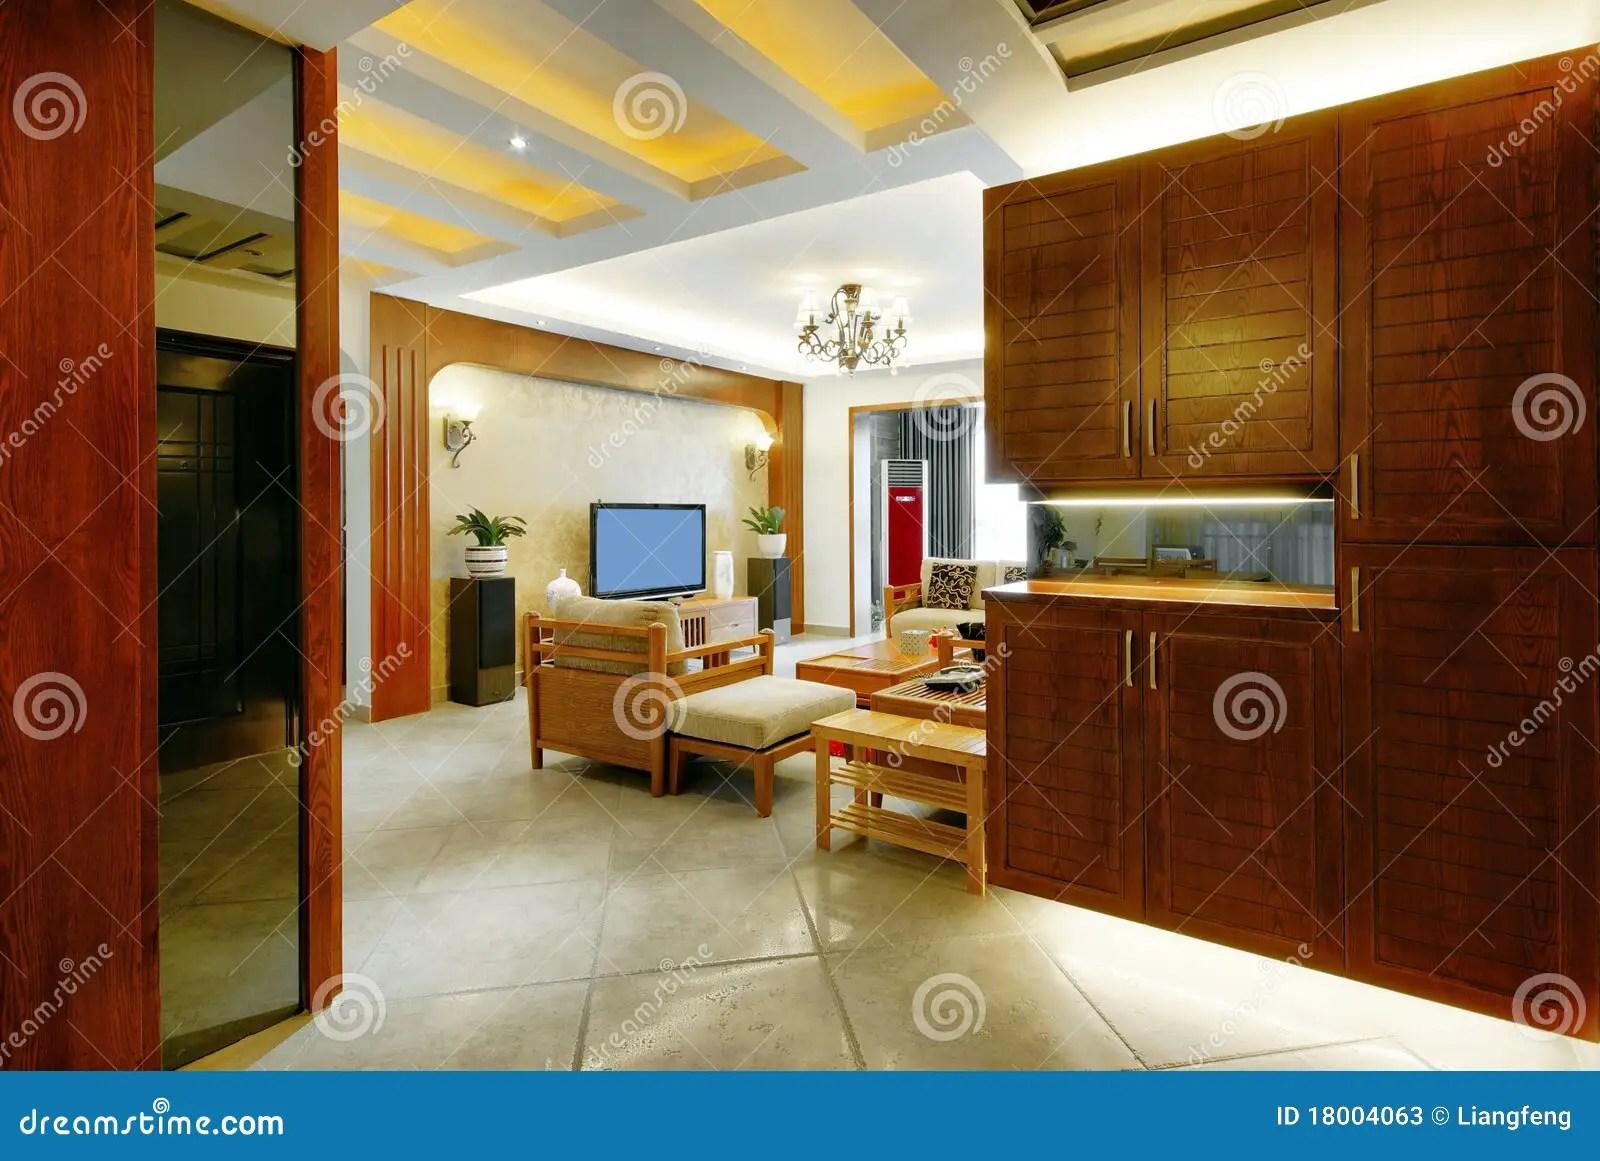 Beautiful home decor stock image. Image of layout, home ... on Beautiful Home Decor  id=66863